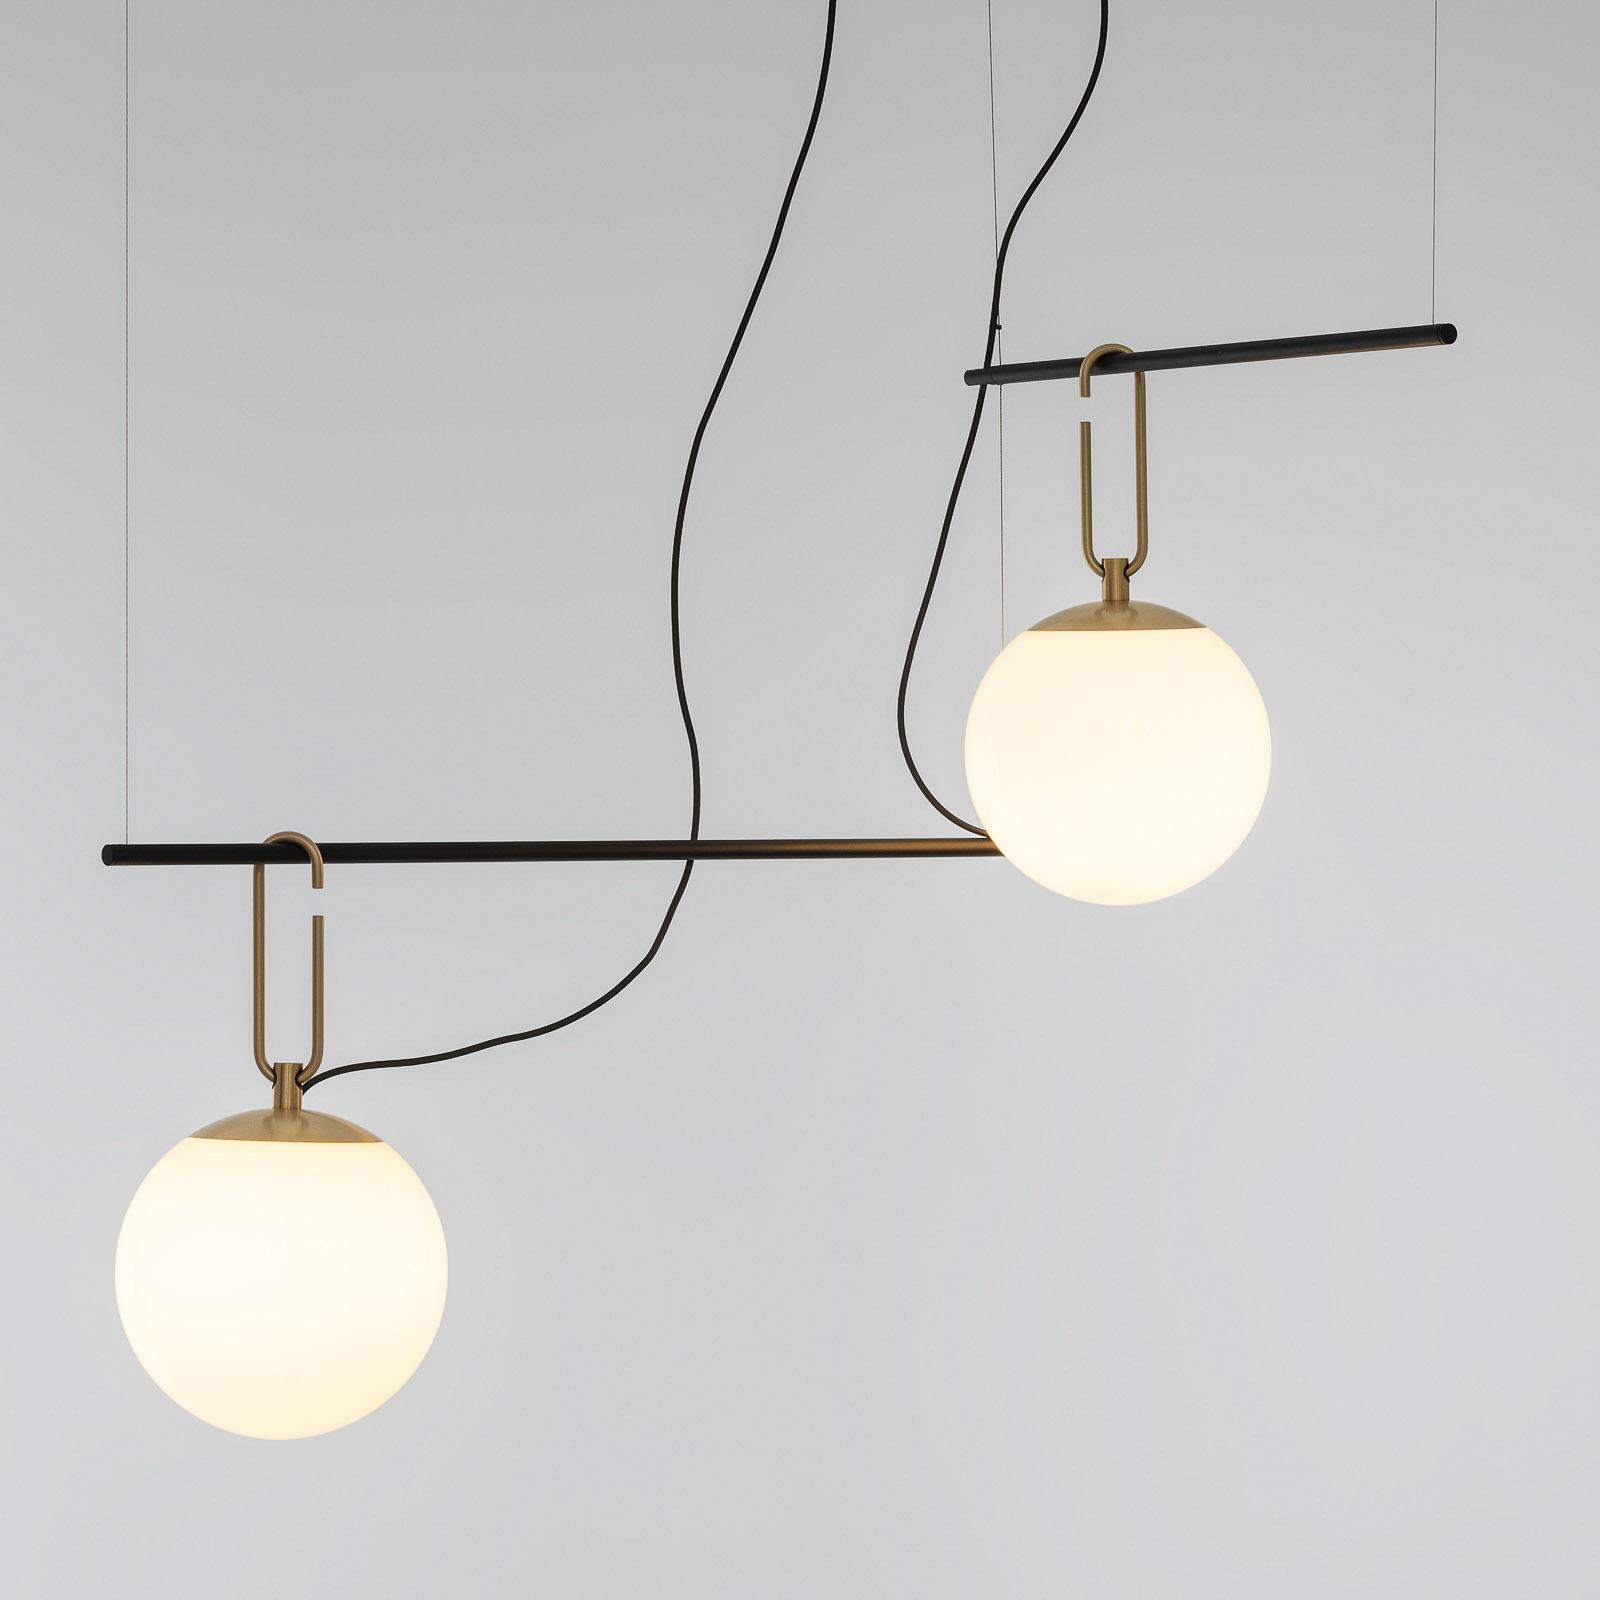 Artemide nh S3 2 sospensione di vetro, 2 luci